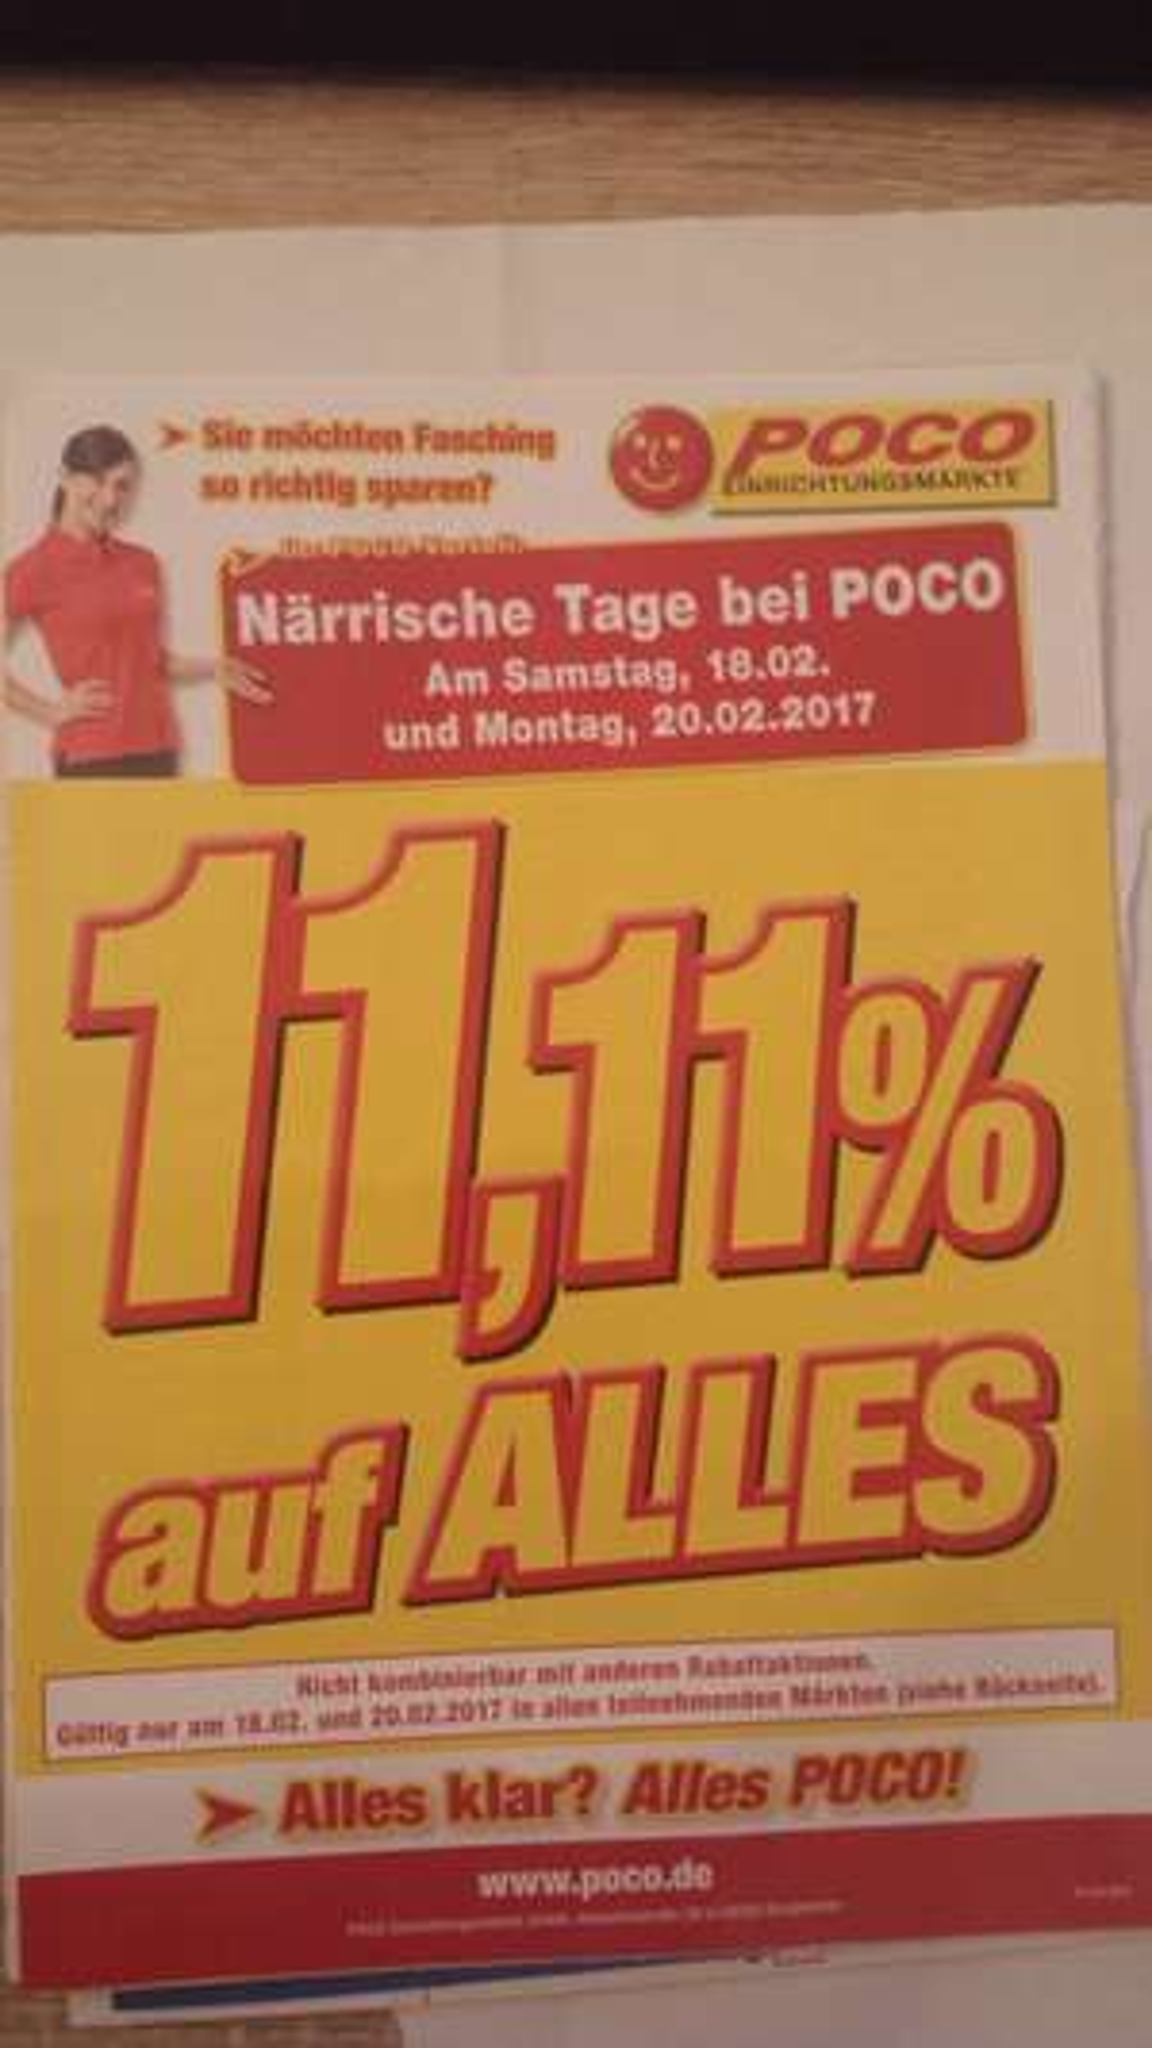 [Lokal] Poco - Närrische Tage bei Poco - 11,11% auf ALLES